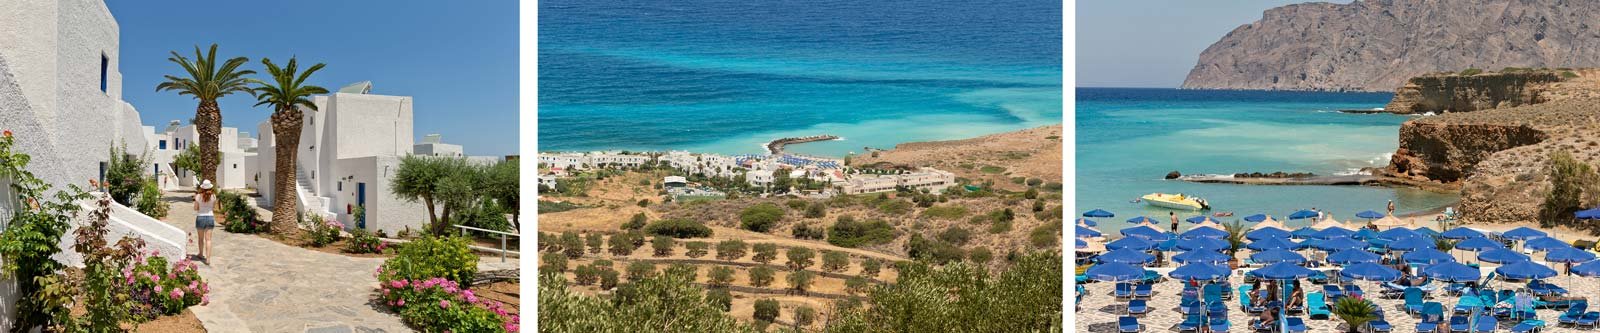 Impressionen zum Club Aldiana Kreta